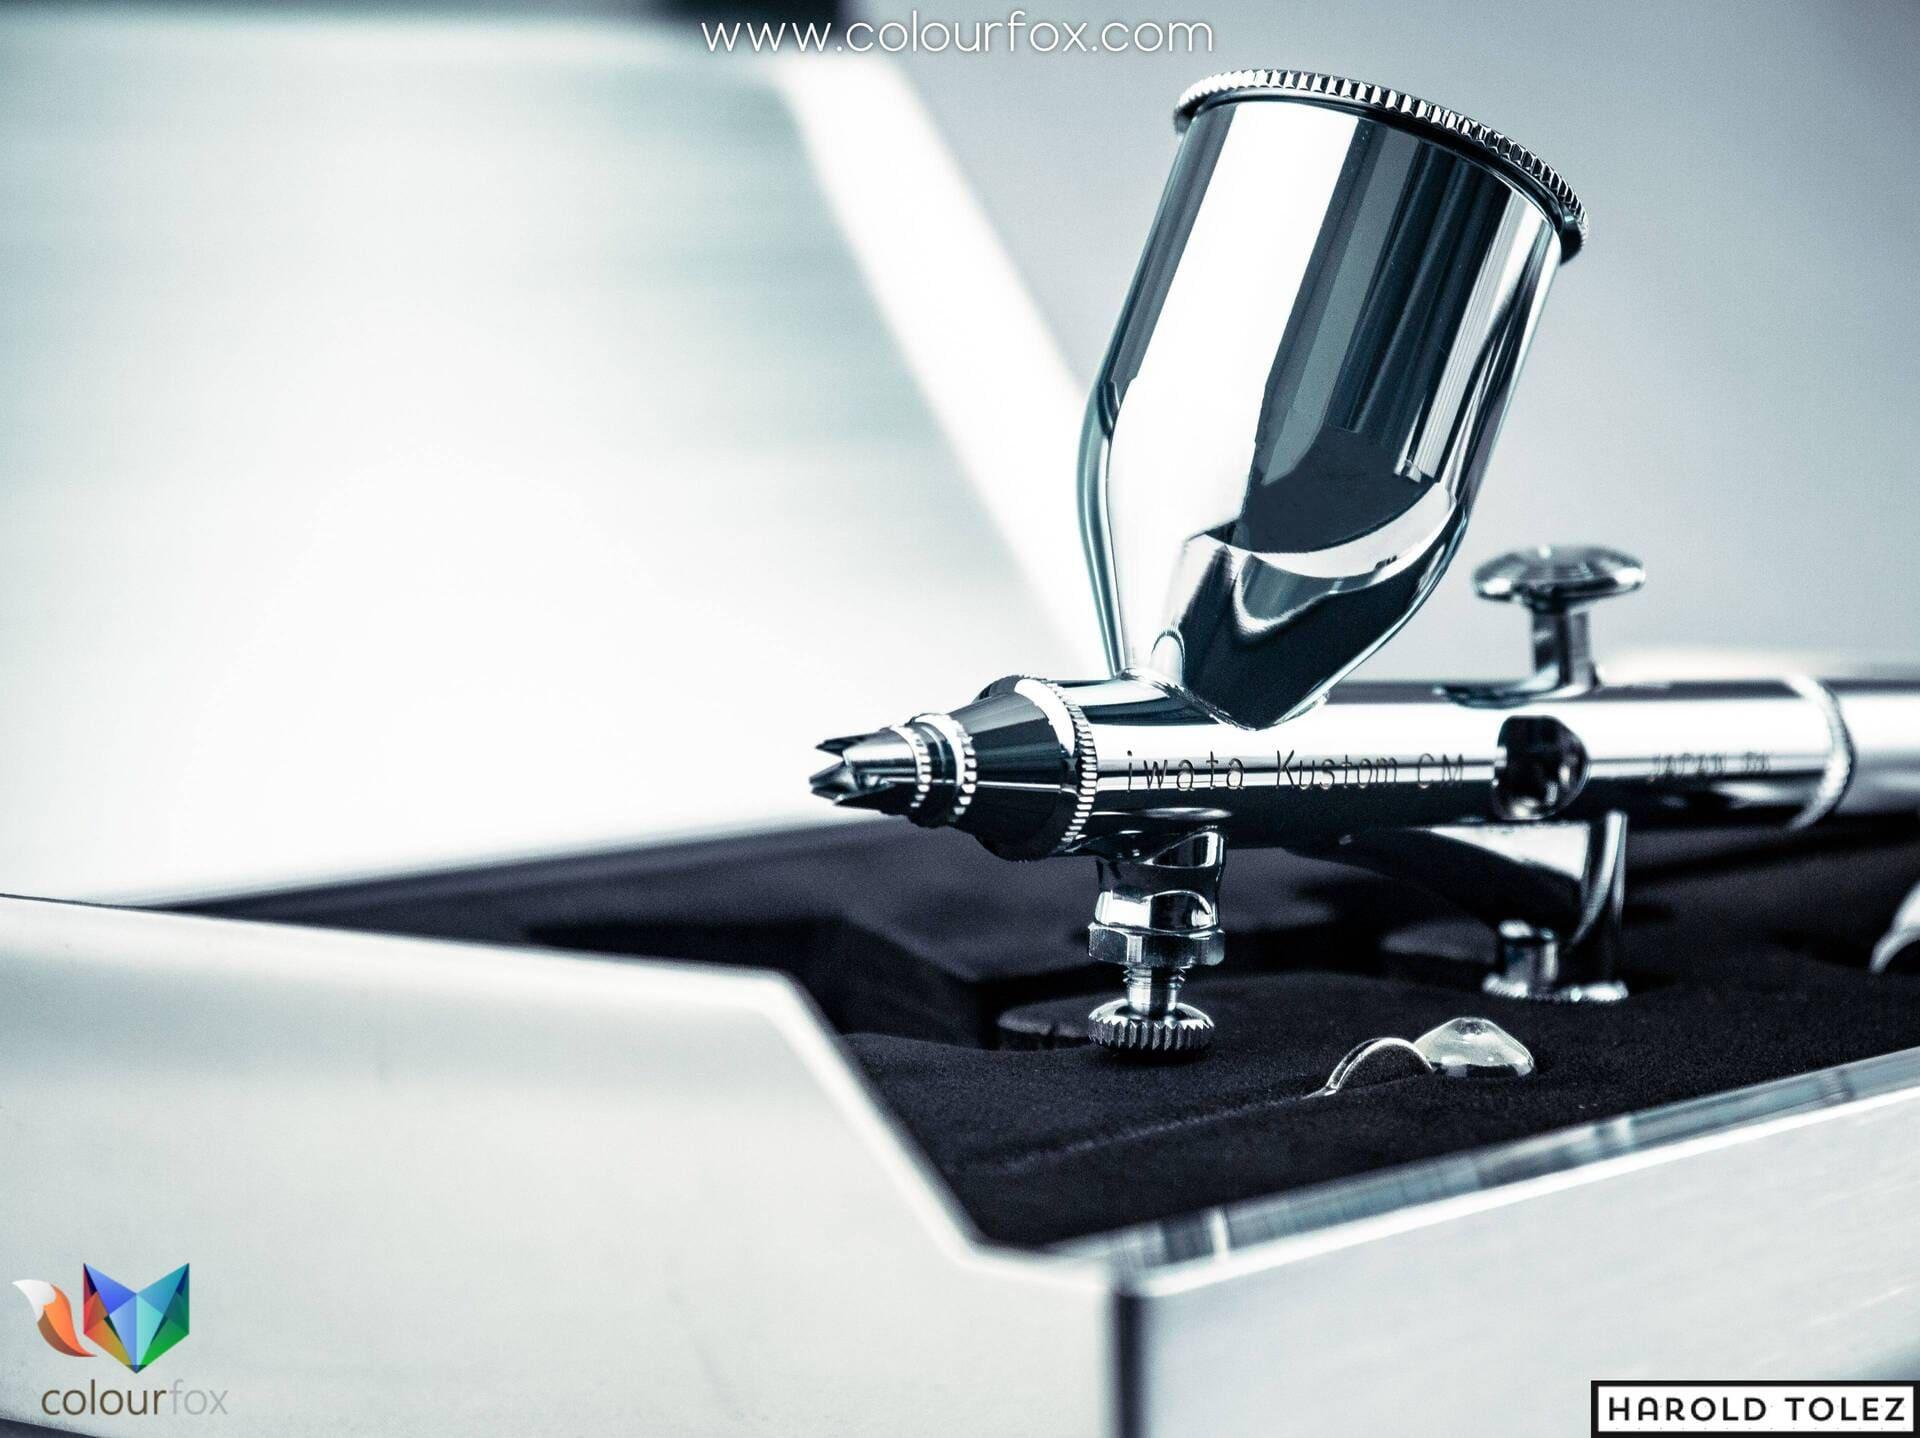 aerografo-anest-Iwata-kustom-micron-cm-edicion limitada